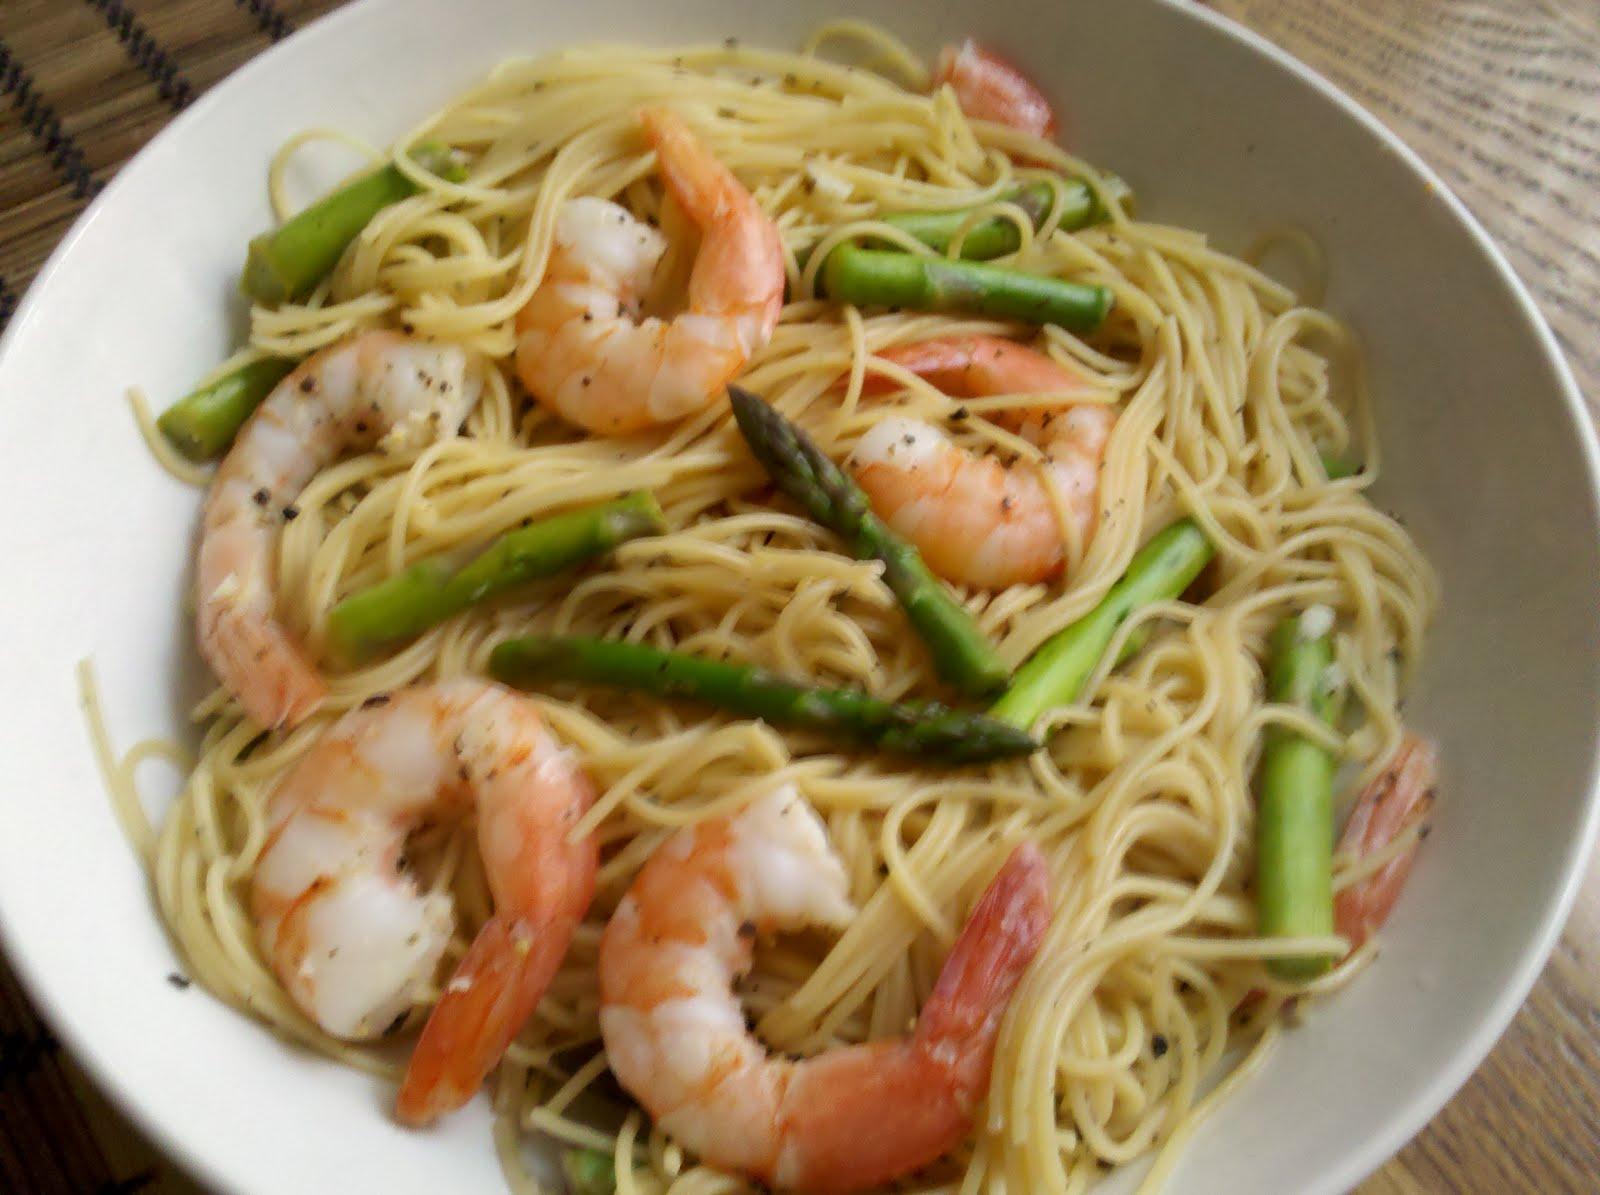 Mega Bites Chicago: Shrimp Scampi with Angel Hair and Asparagus